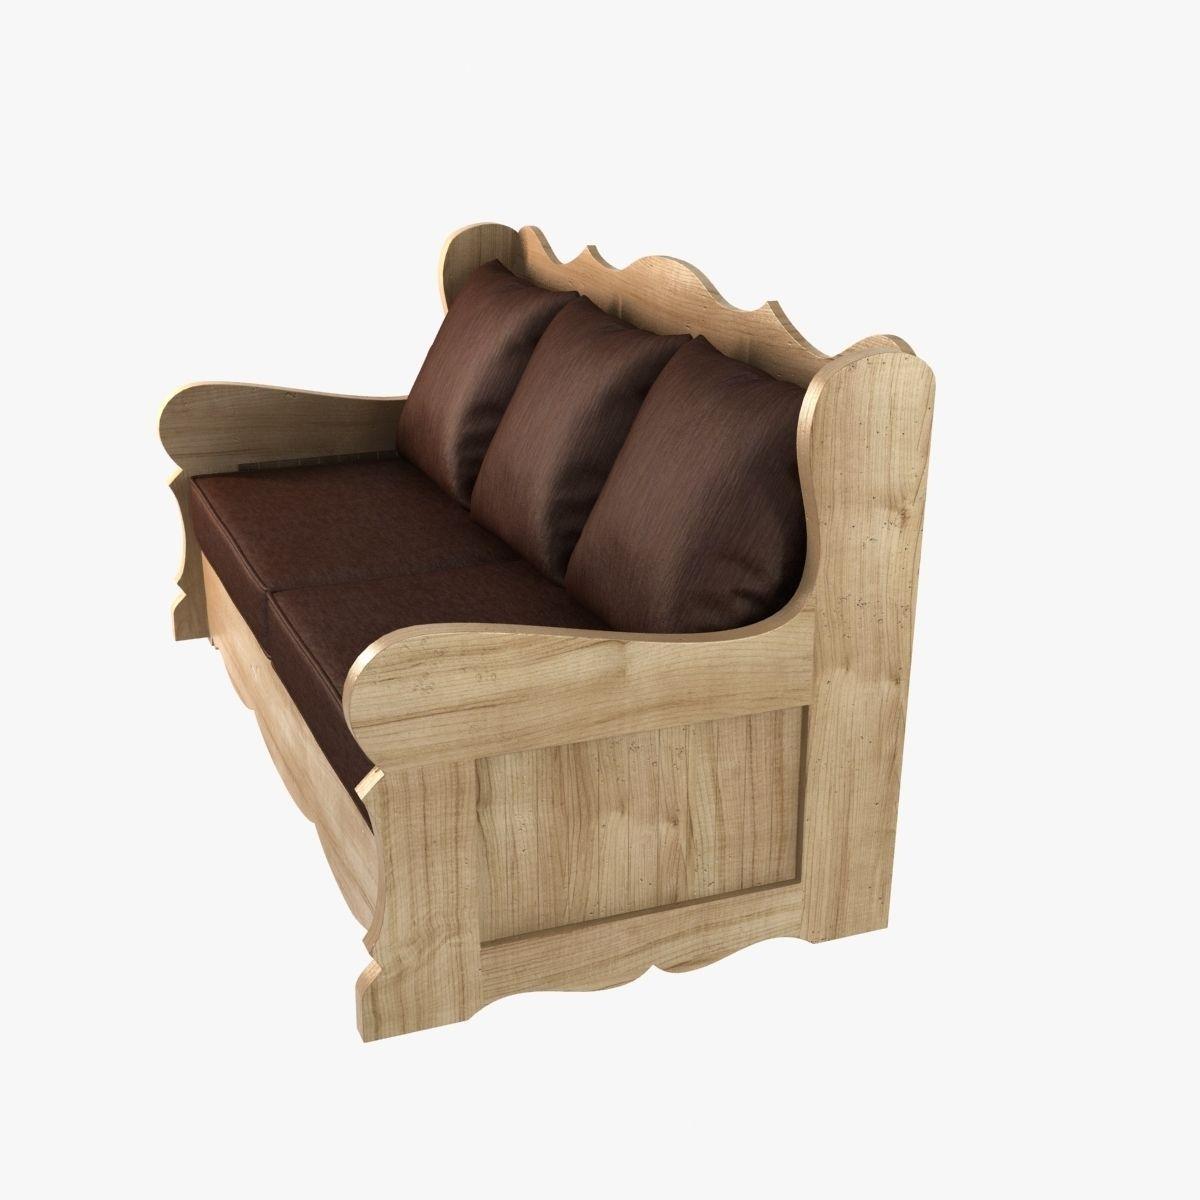 Wood Sofa Provence Village Style 3D Model Max Obj 3ds